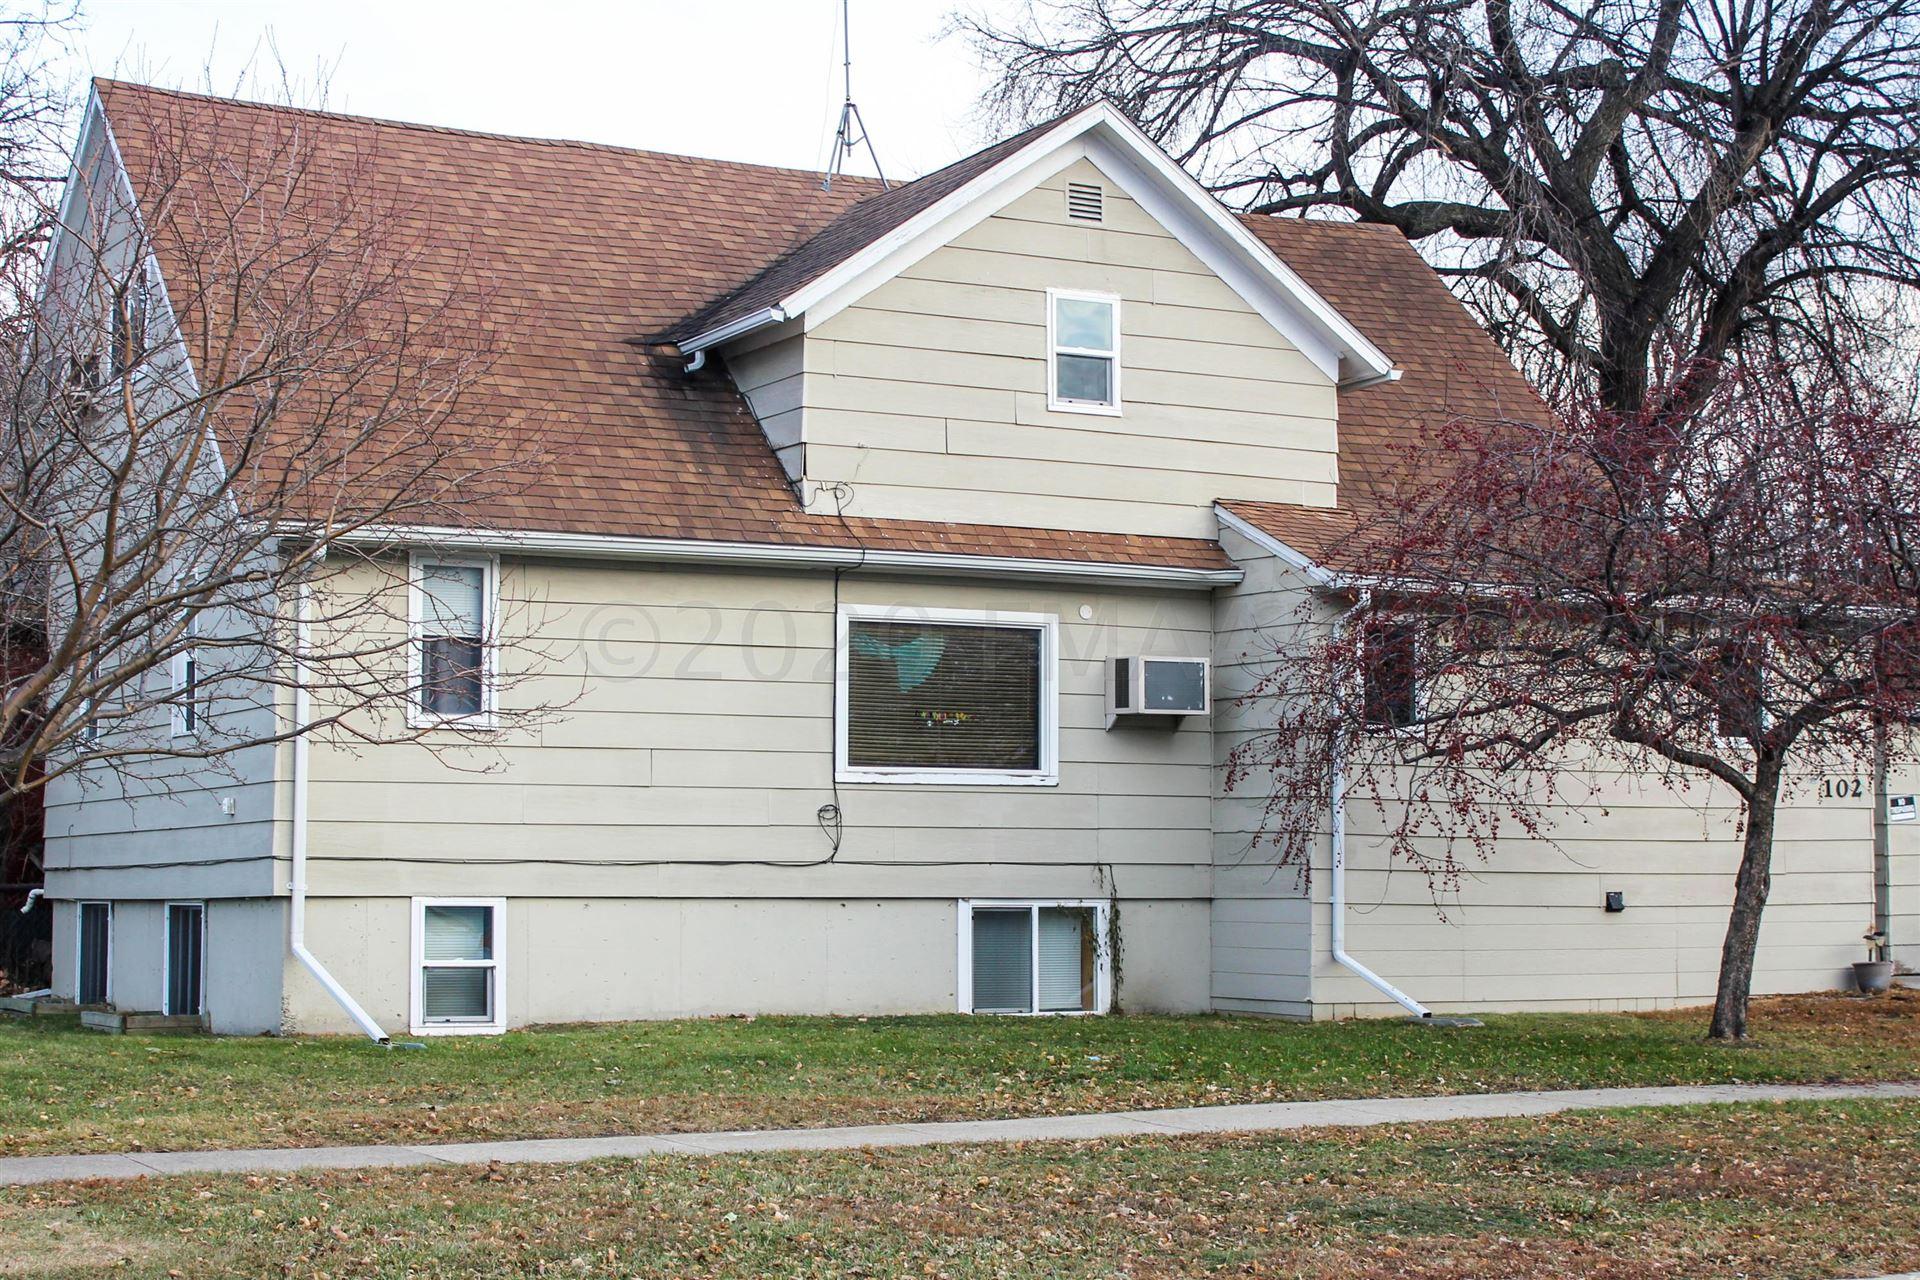 102 14 Street S, Fargo, ND 58103 - #: 20-6522